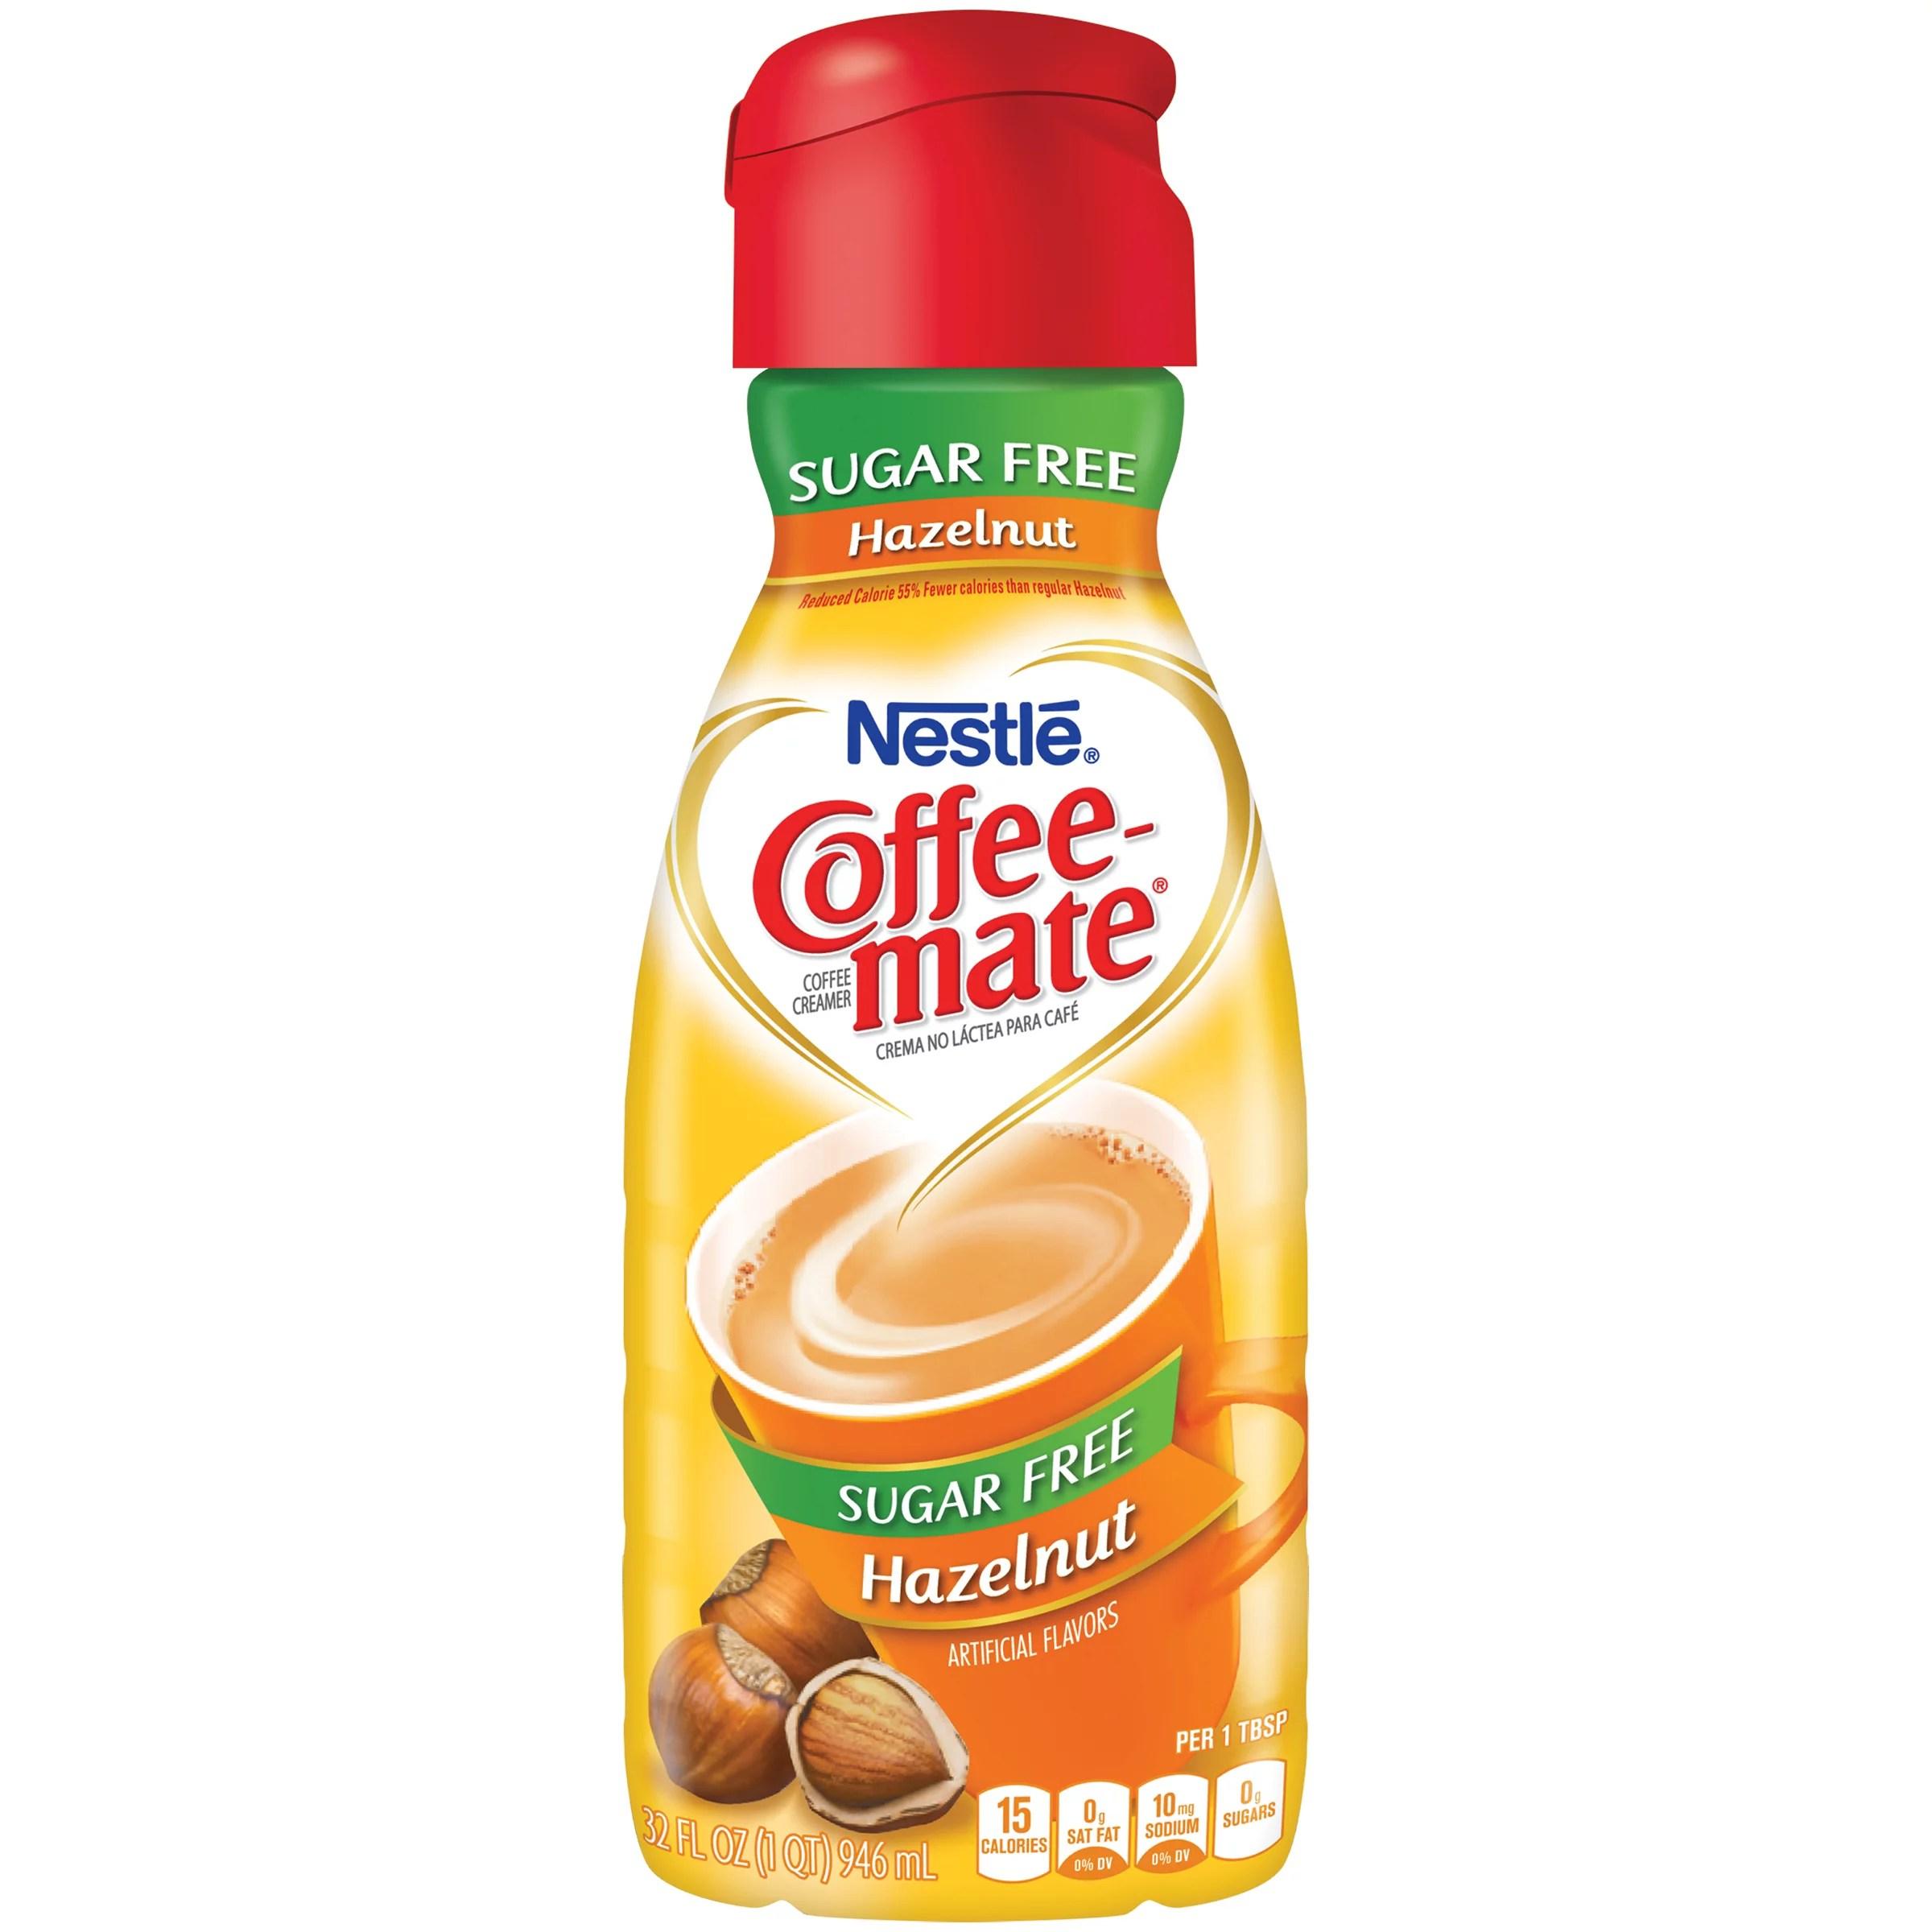 Creamer Liquid Mate Oz Coffee Or Powder 2 10 Larger Or Nestle Coffee